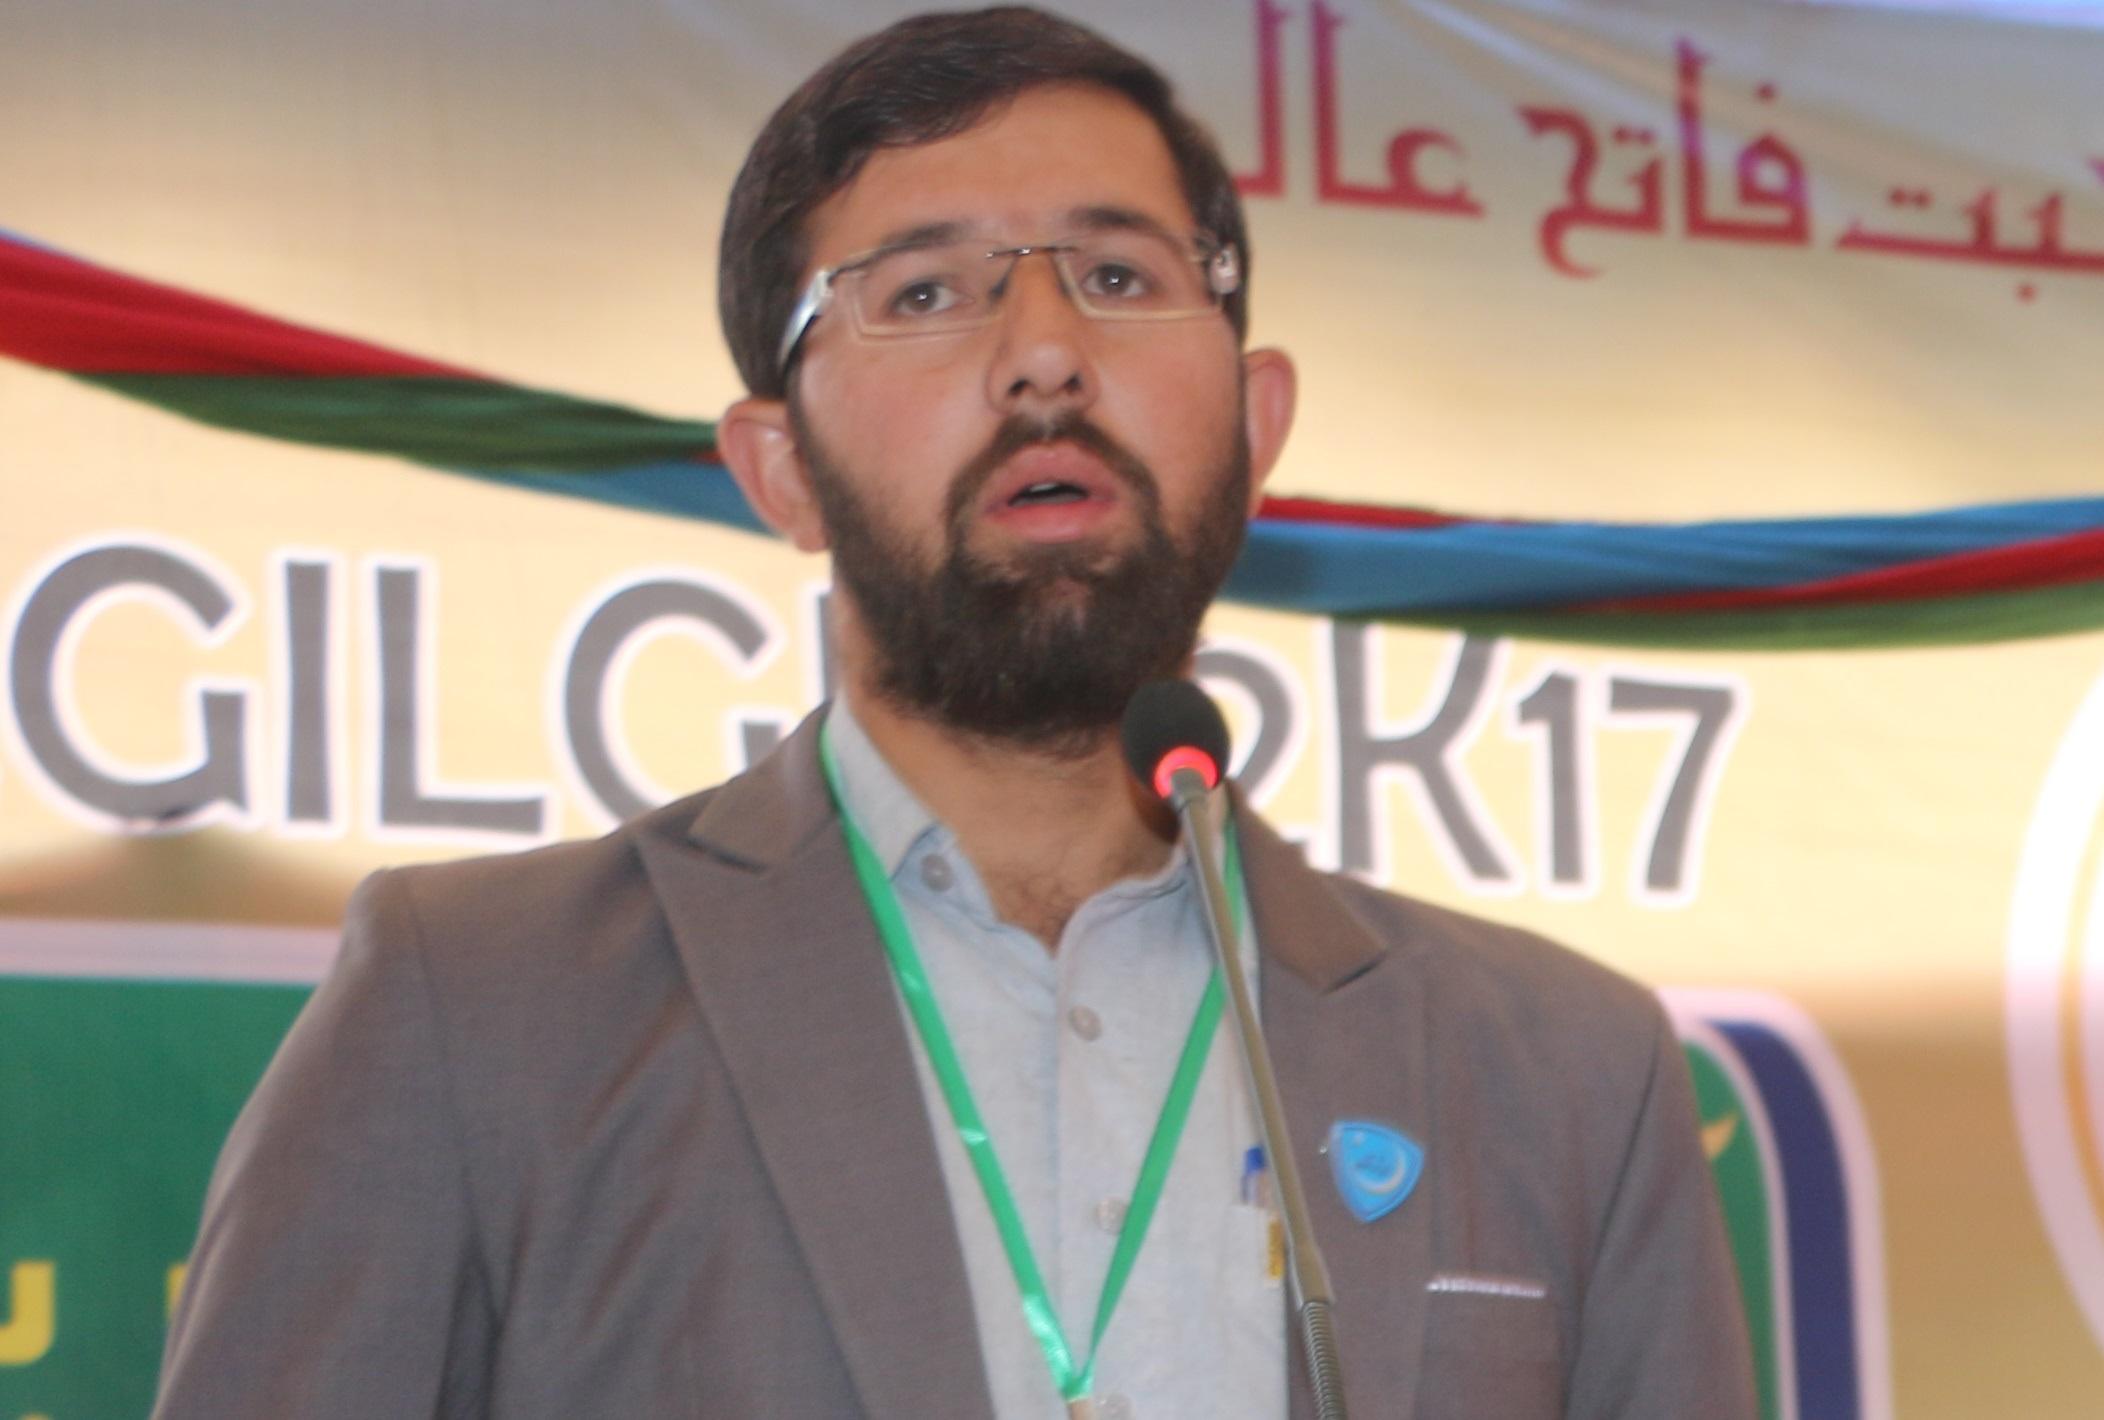 سعید الرحمن ناظم منتخب جبکہ منظور عالم معتمد (سیکریٹری ) اسلامی جمعیت طلبہ گلگت مقرر